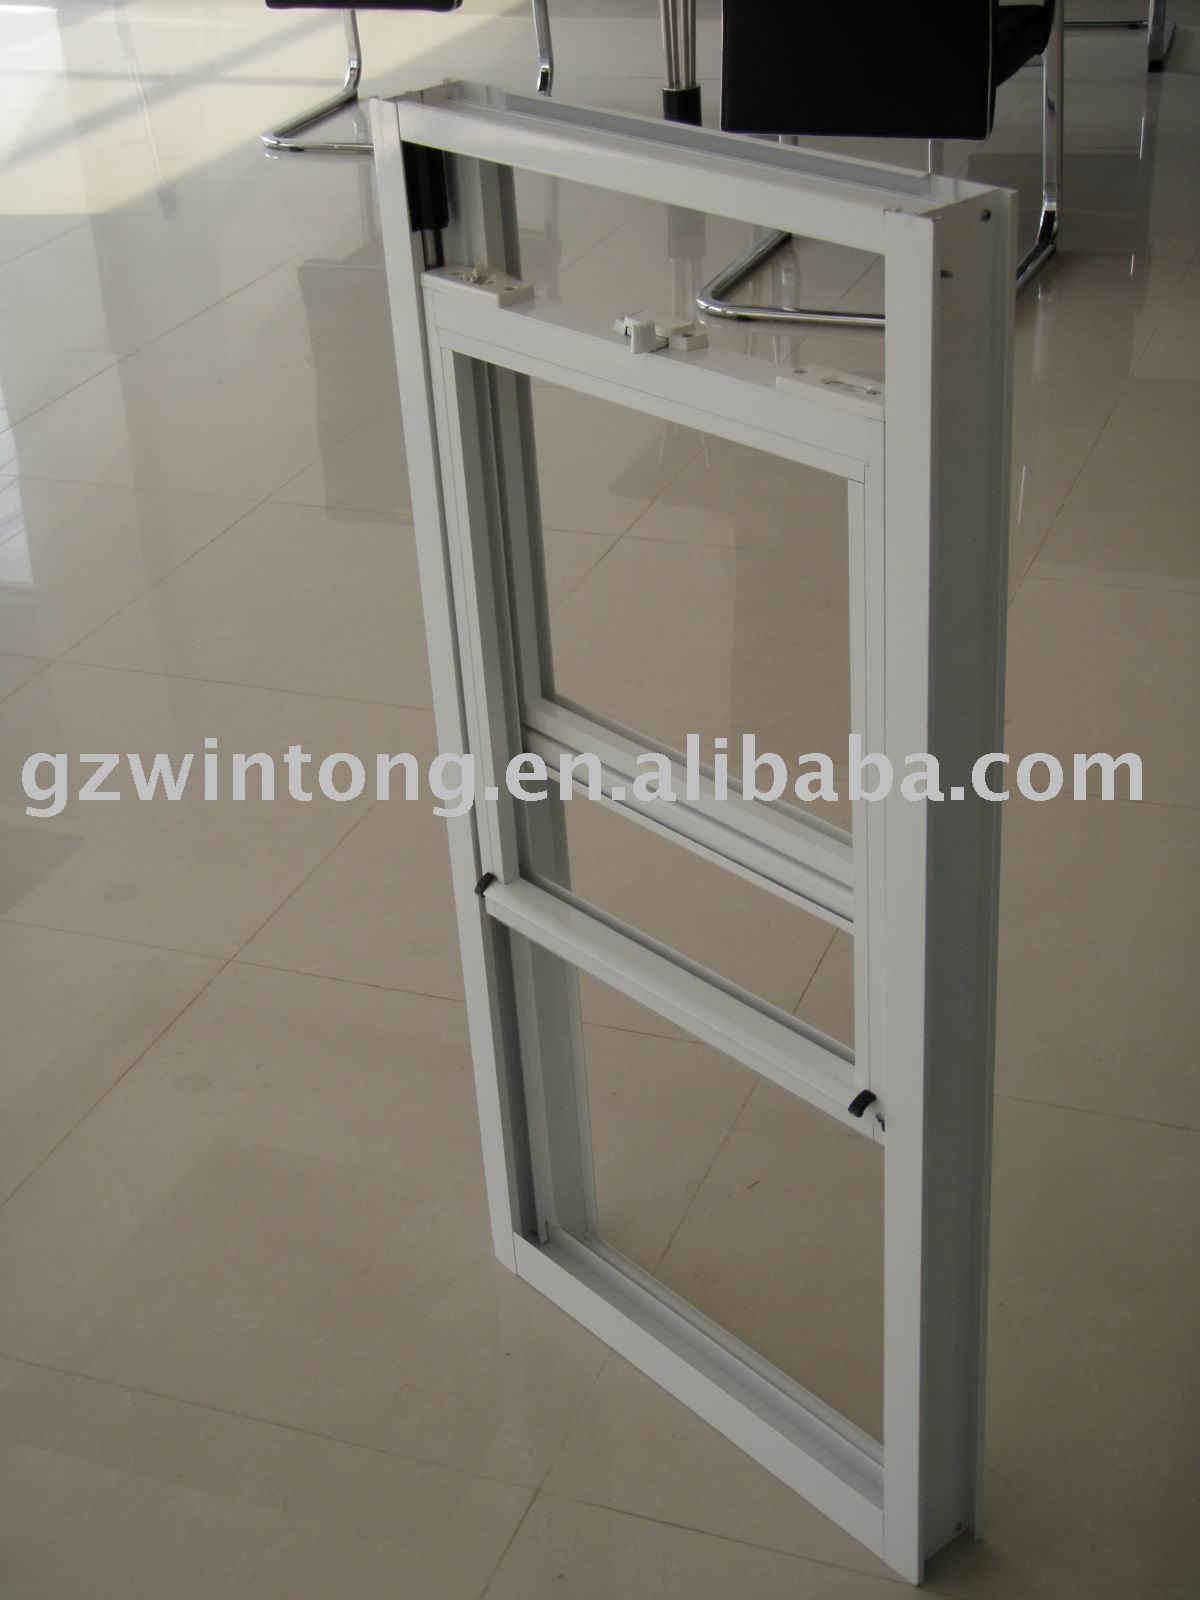 #4F4359 Alumínio janela de guilhotina Janelas ID do produto:235770921  1946 Janela De Aluminio Tipo Guilhotina Preço